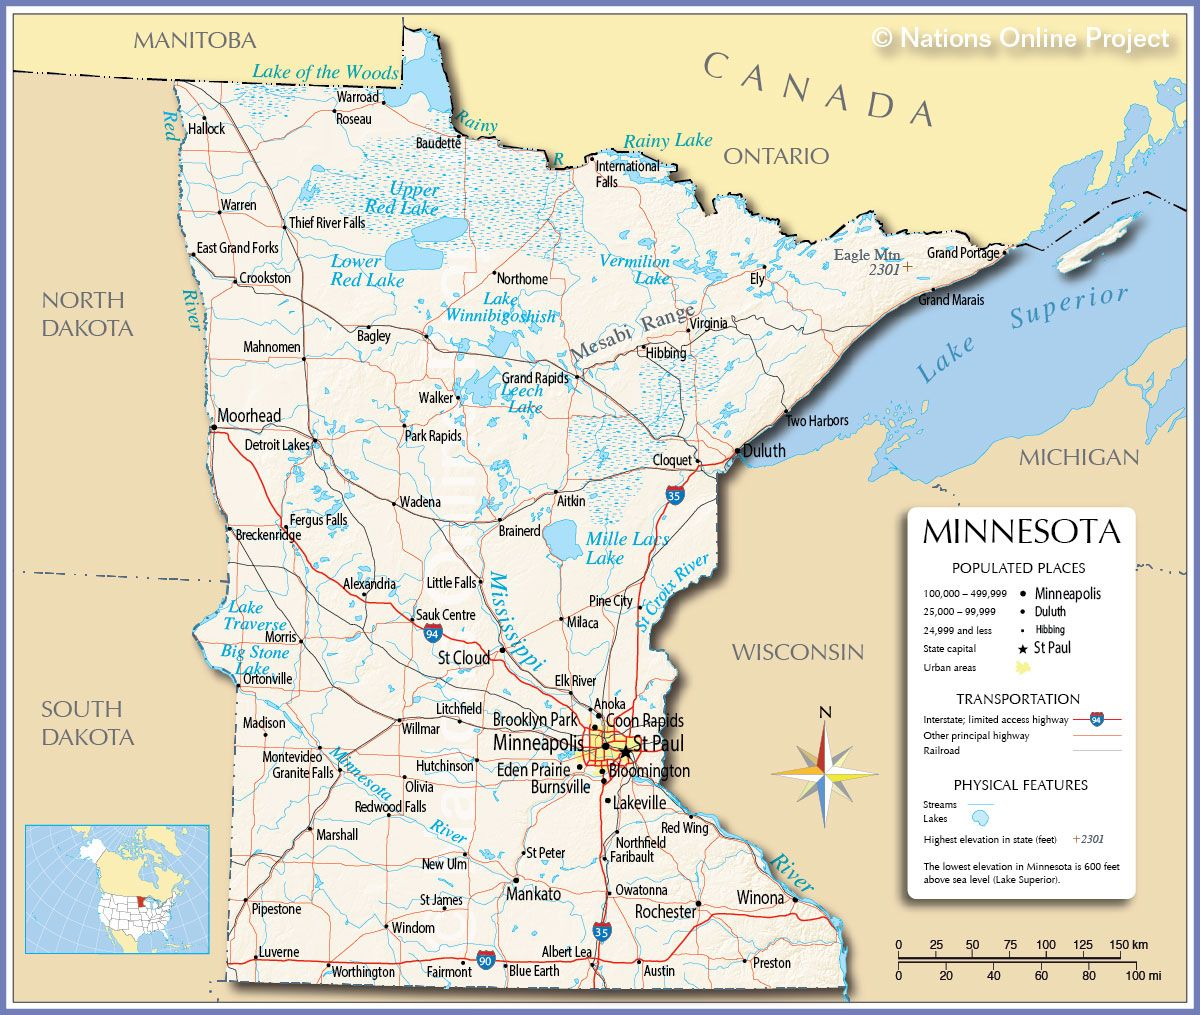 Reference Map of Minnesota | MN | Minnesota, U.S. States, Somali ...